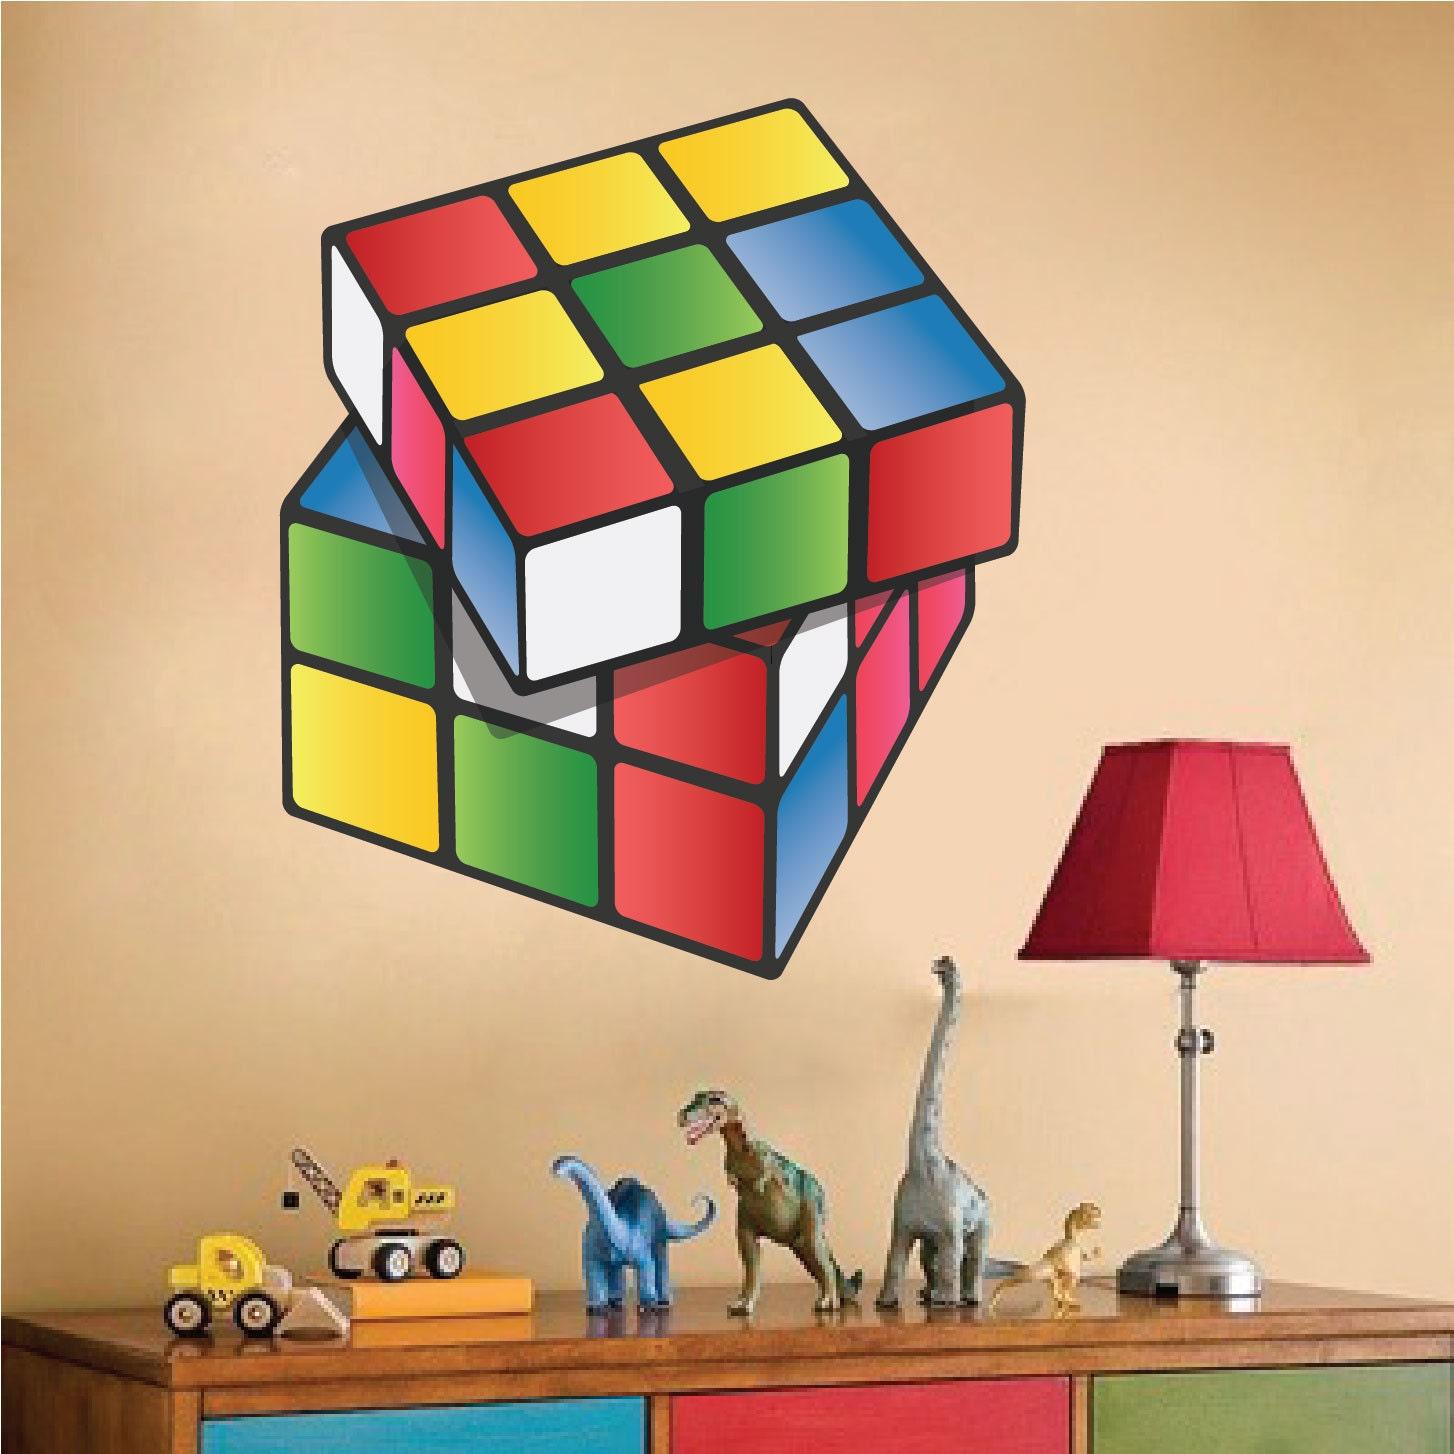 Rubik 39 s cube decals rubik 39 s cube wall art design by primedecal - Cube wall decor ...